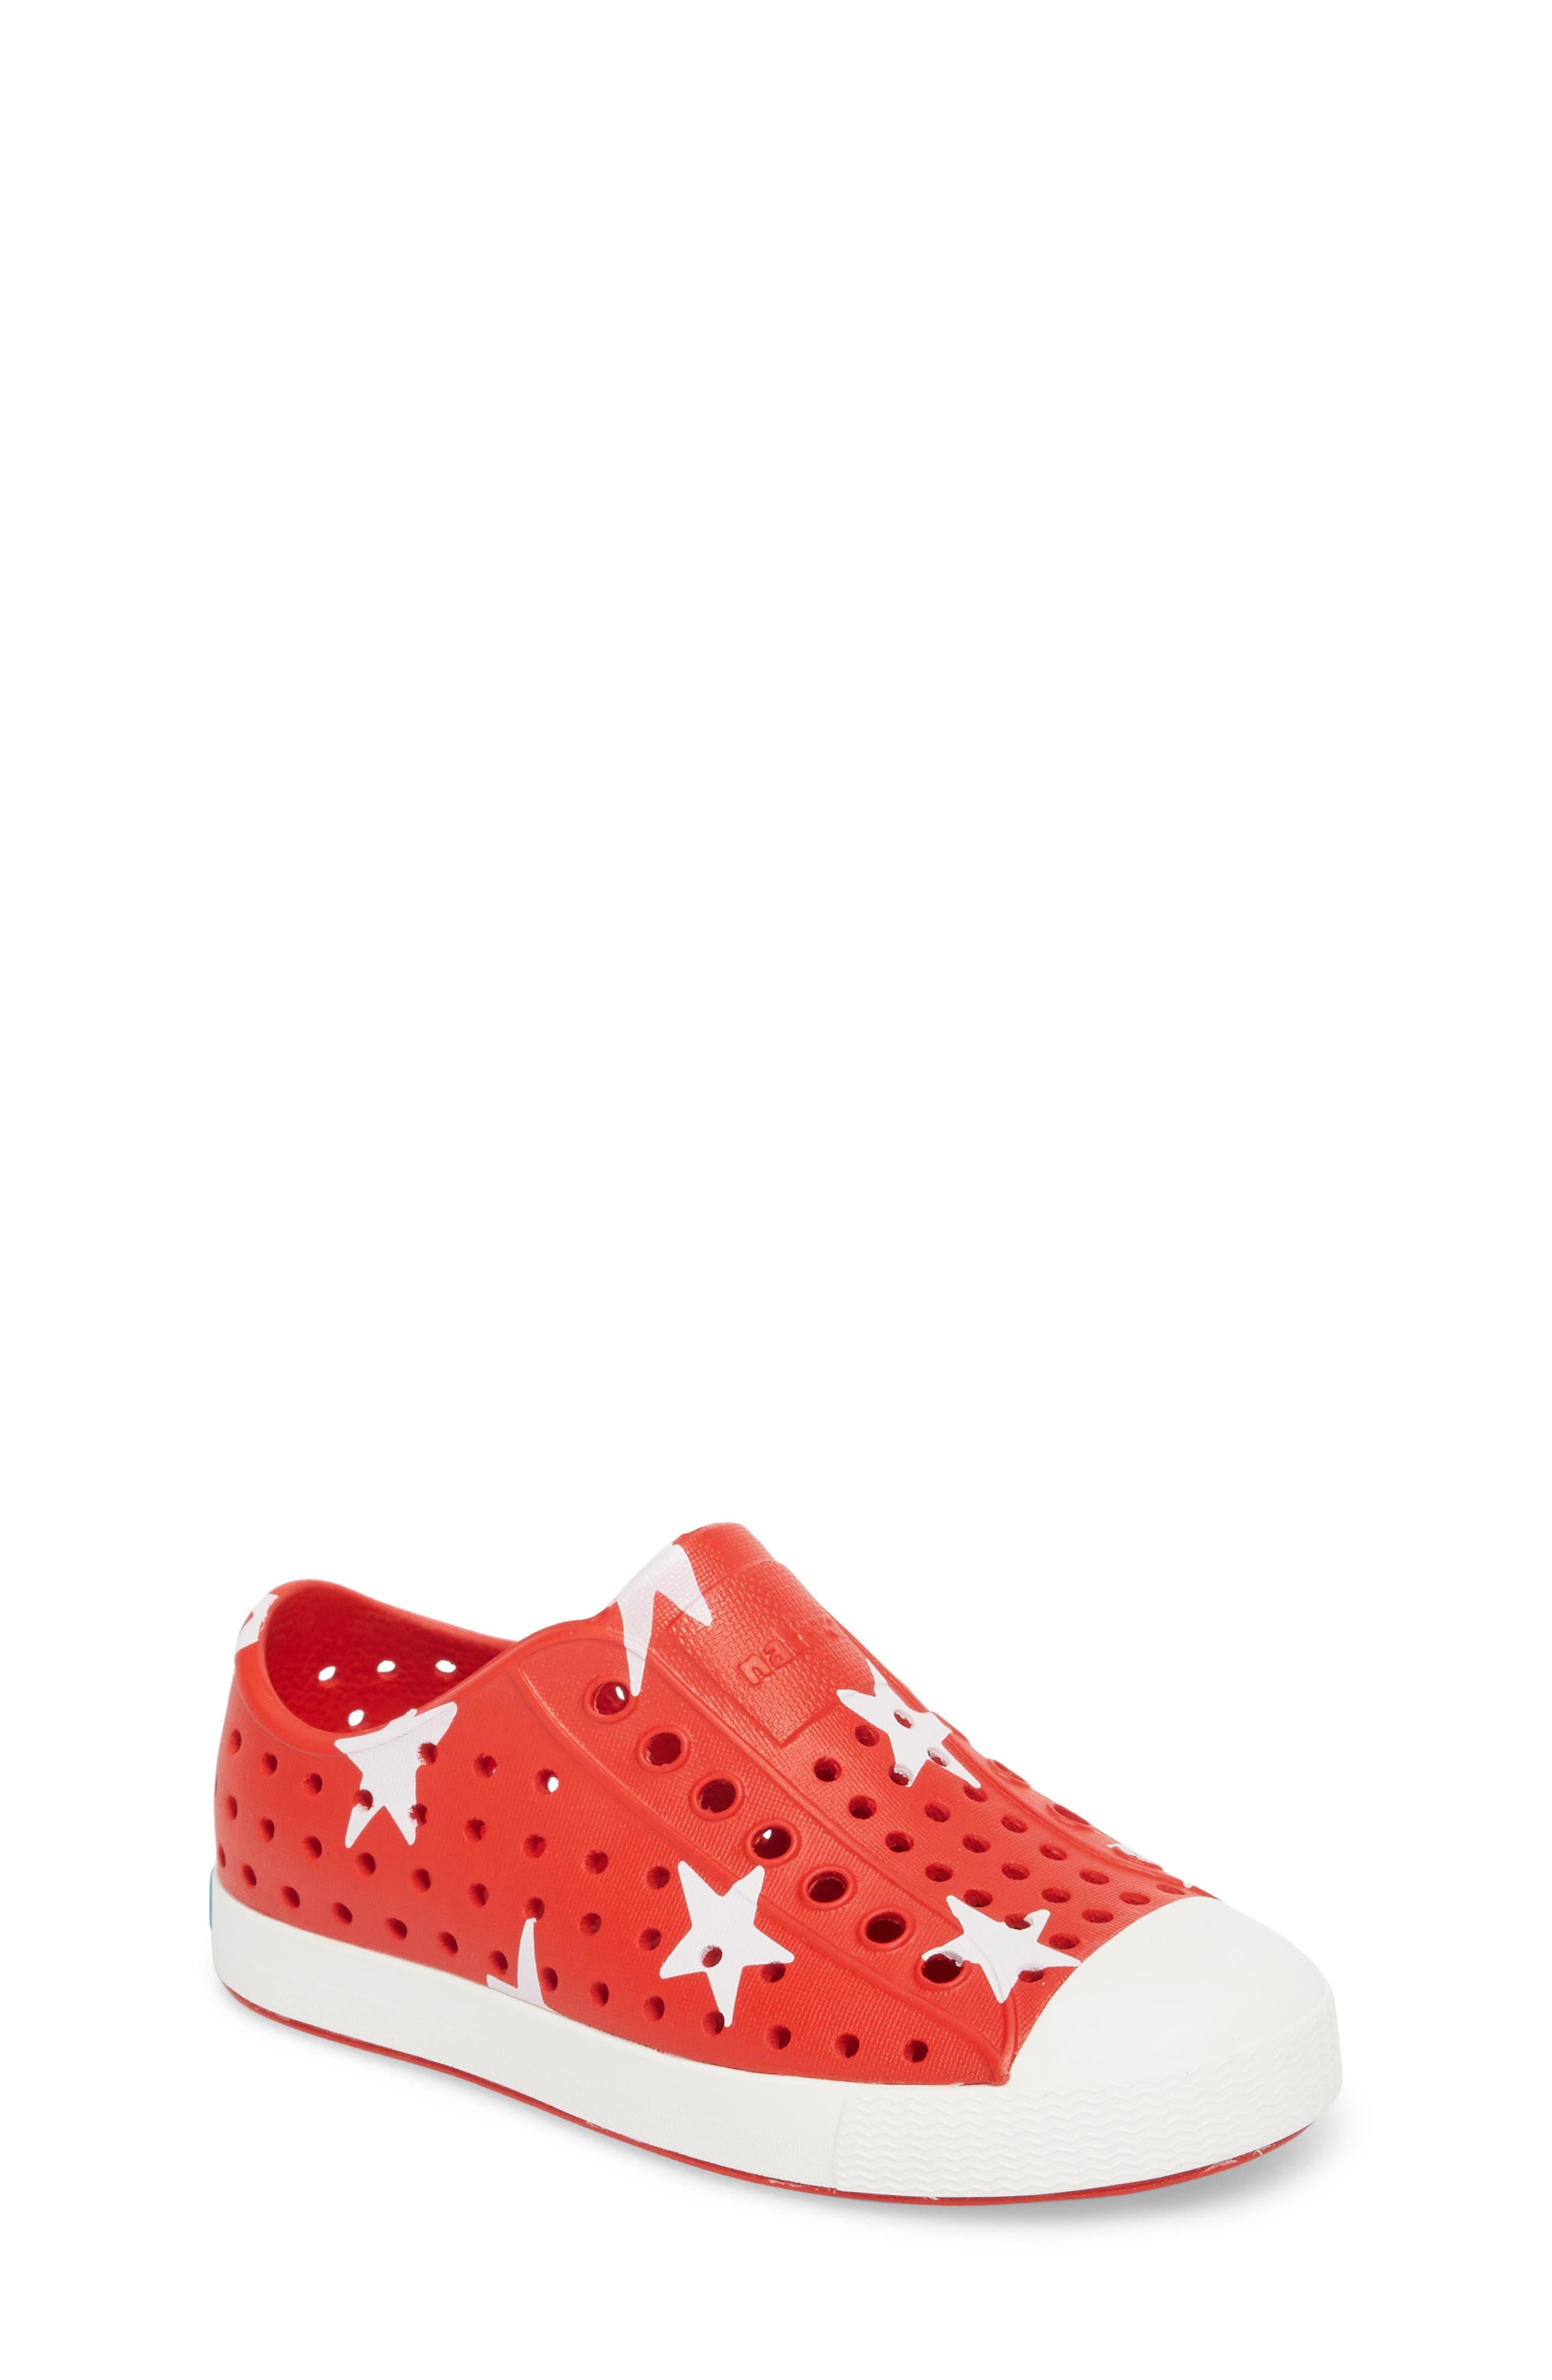 Jefferson Quartz Slip-On Sneaker,                             Main thumbnail 1, color,                             TORCH RED/ BONE WHITE/ STAR